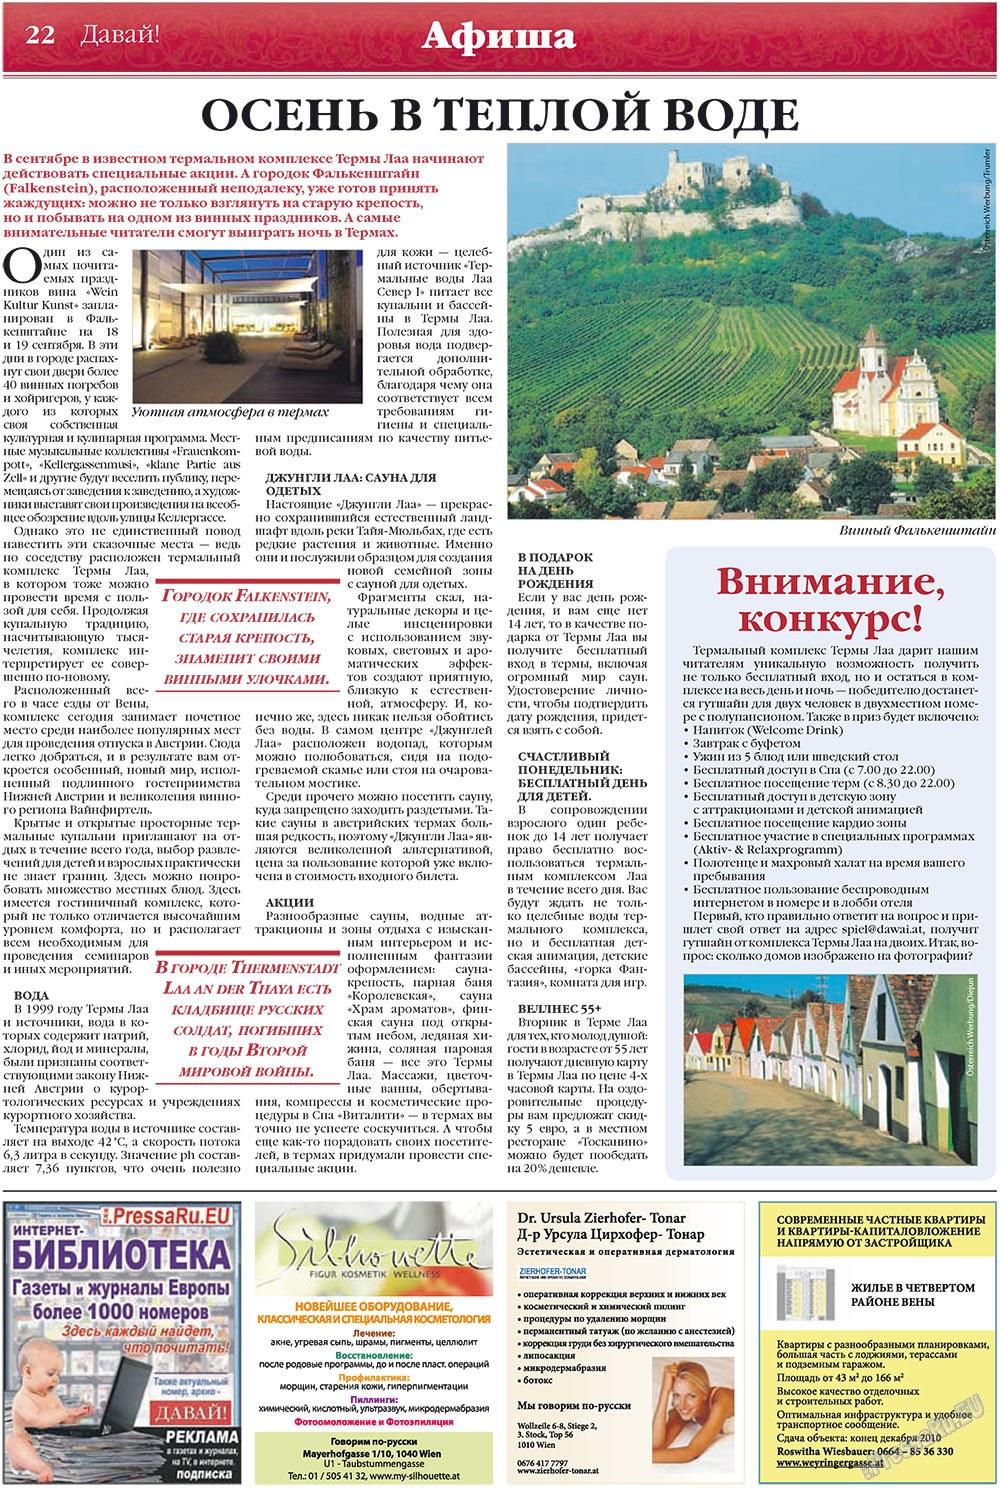 Давай (газета). 2010 год, номер 8, стр. 22